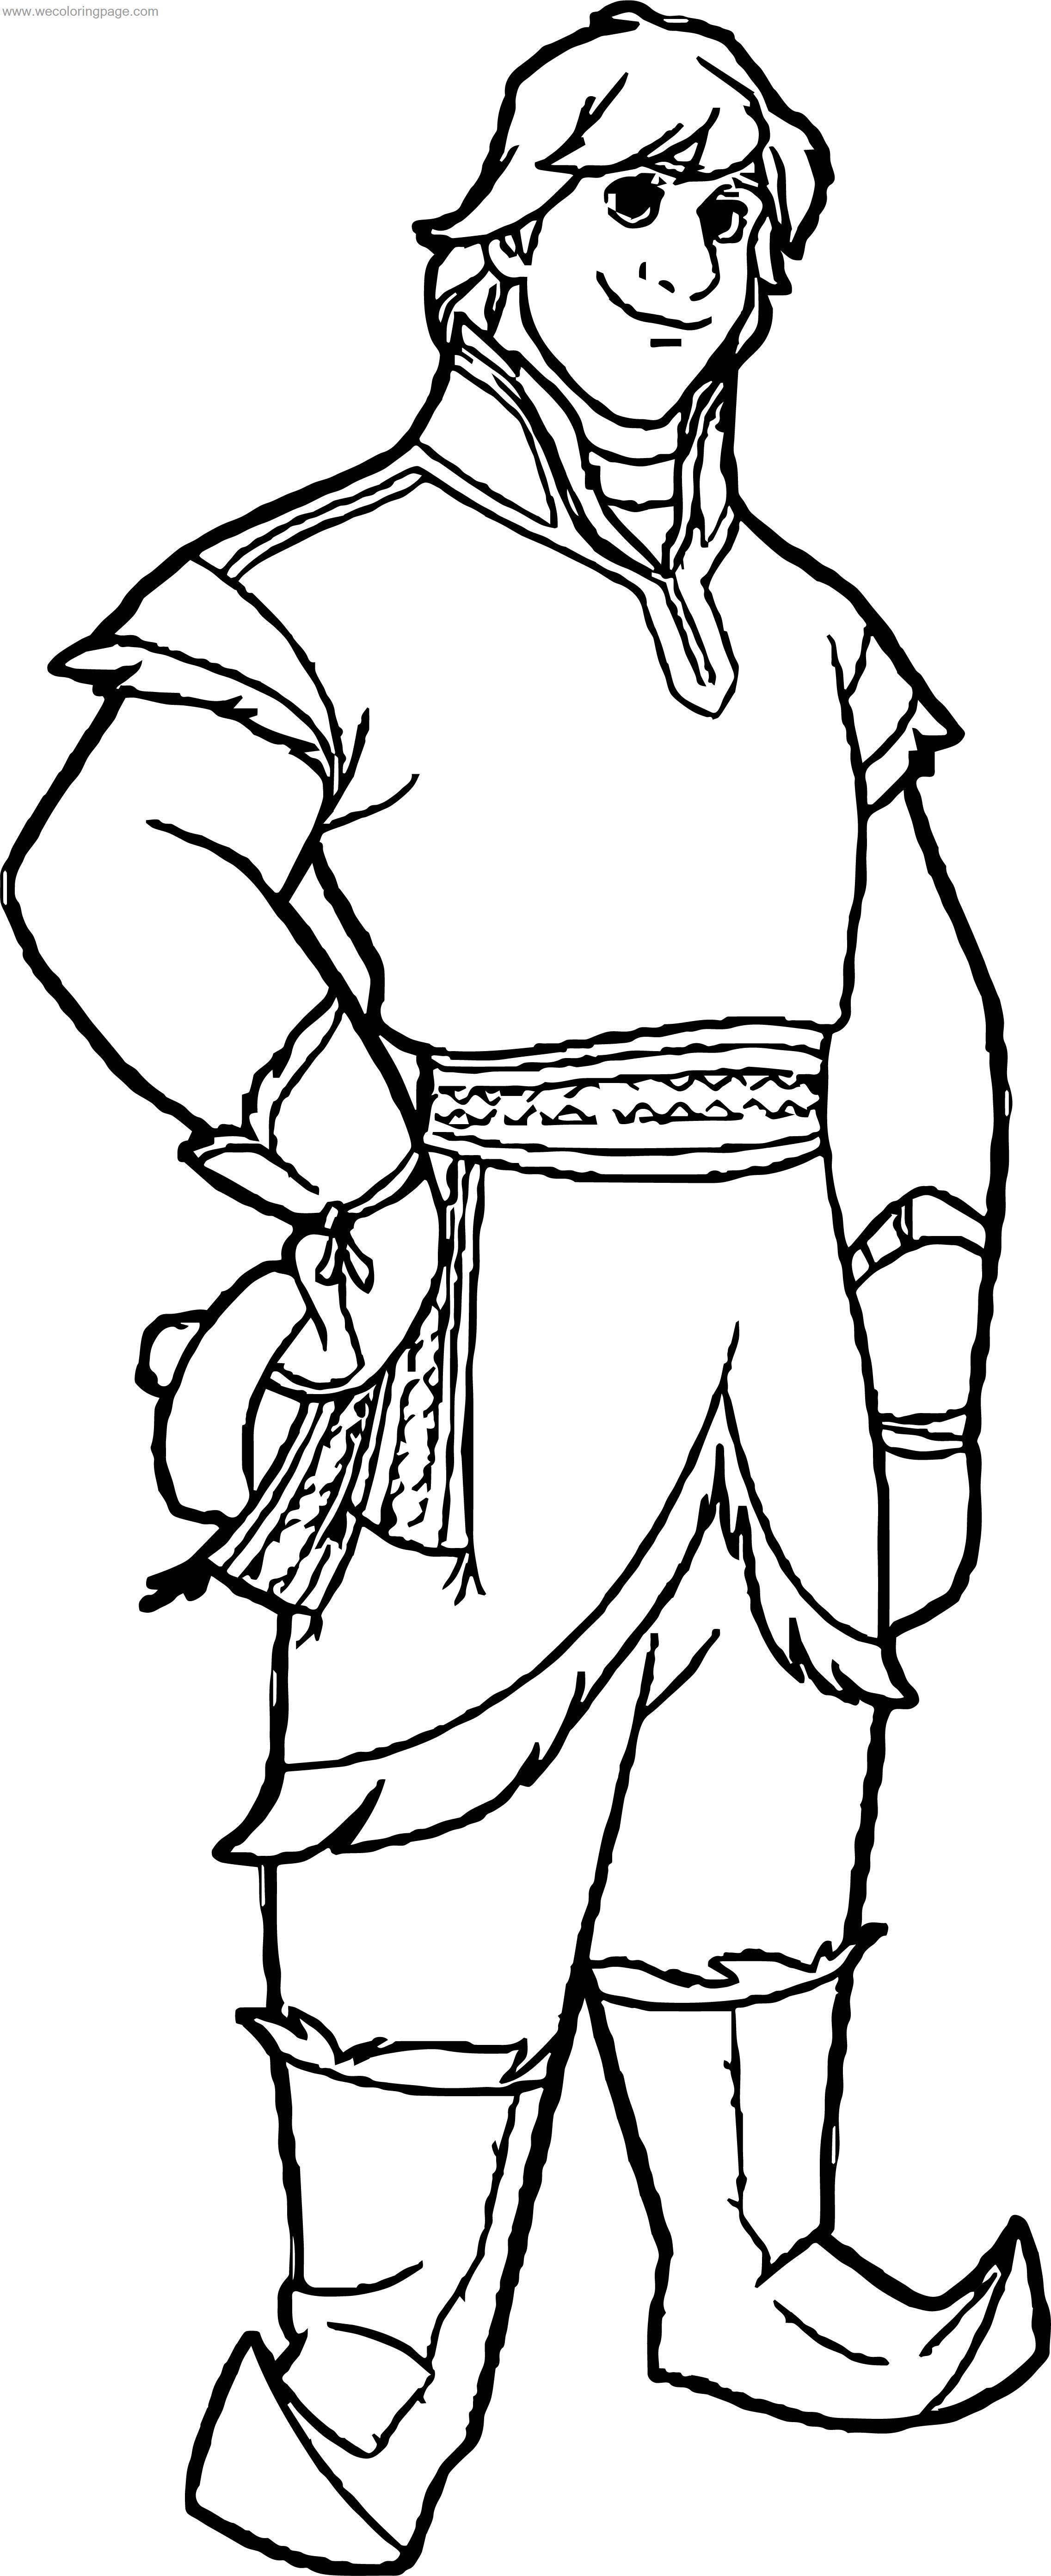 Kristoff Pose Coloring Page